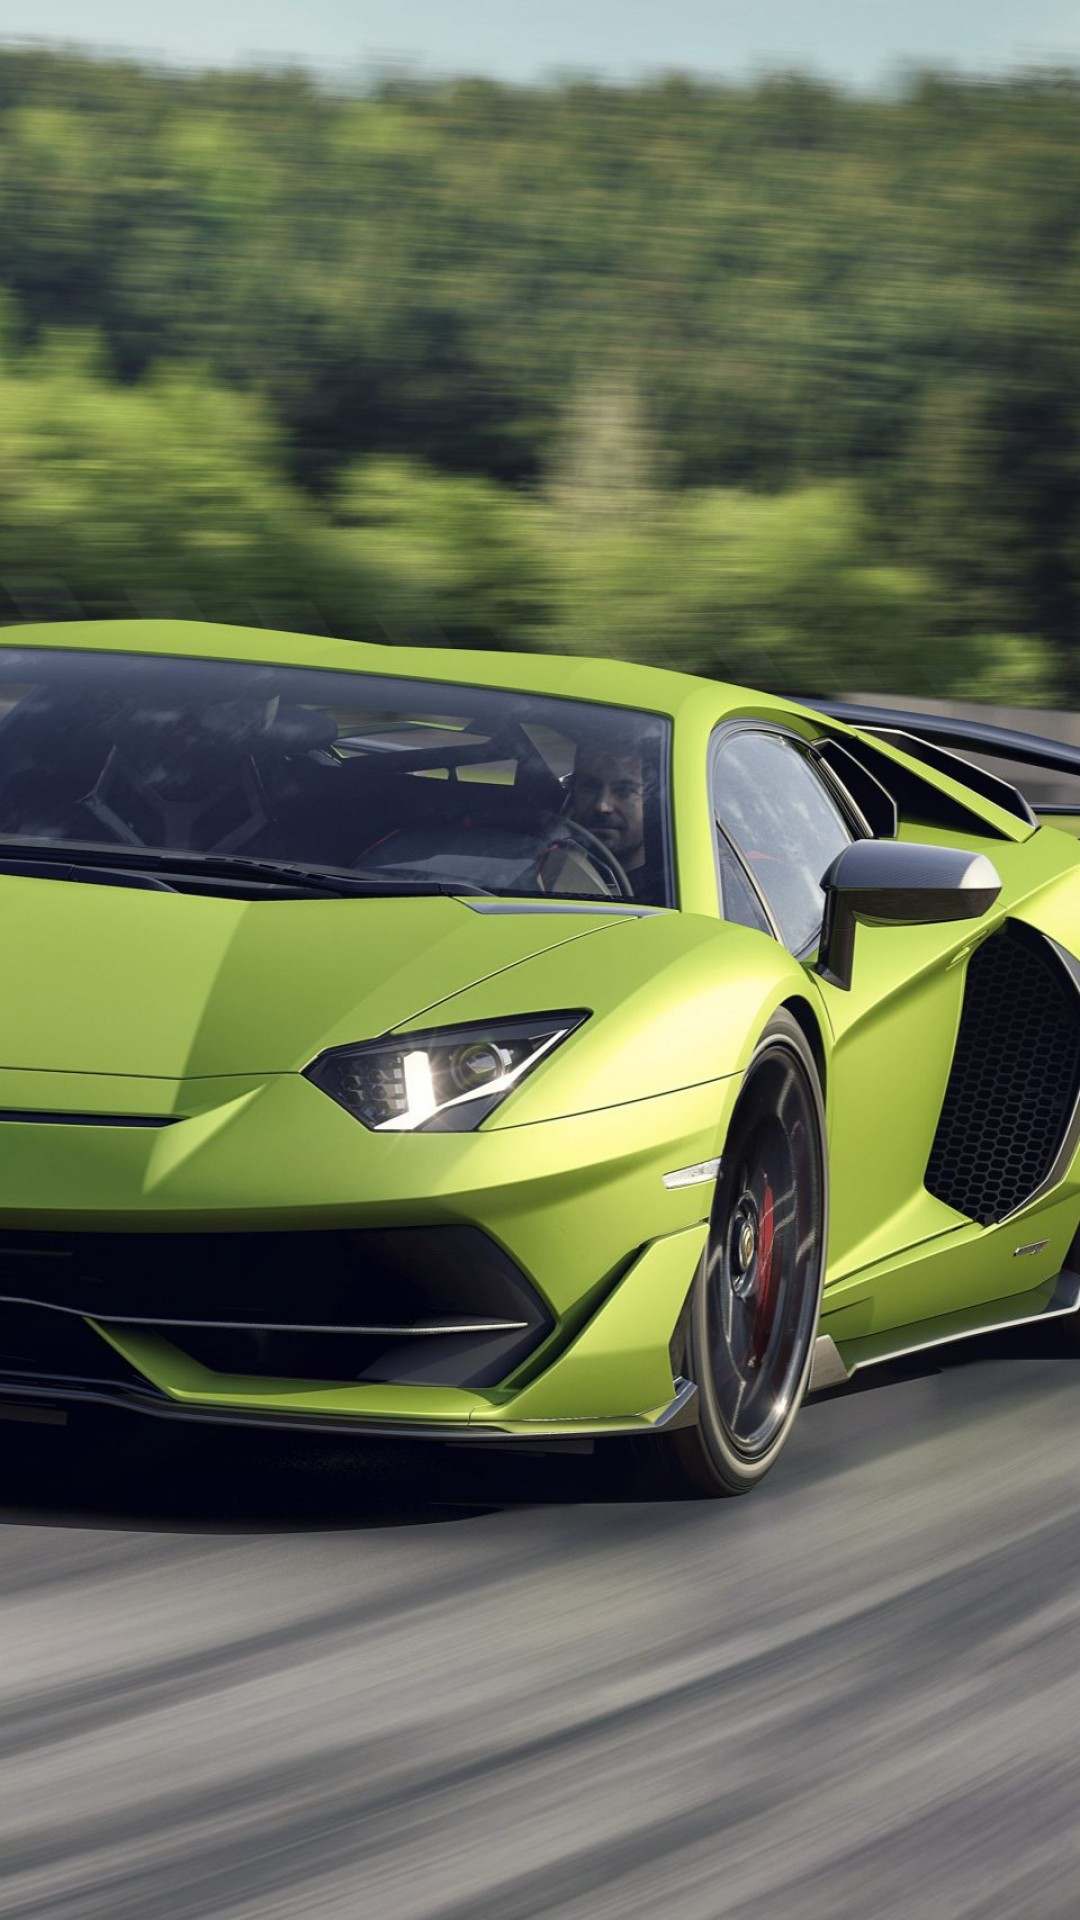 Wallpaper Lamborghini Aventador SVJ, 2019 Cars, supercar ...